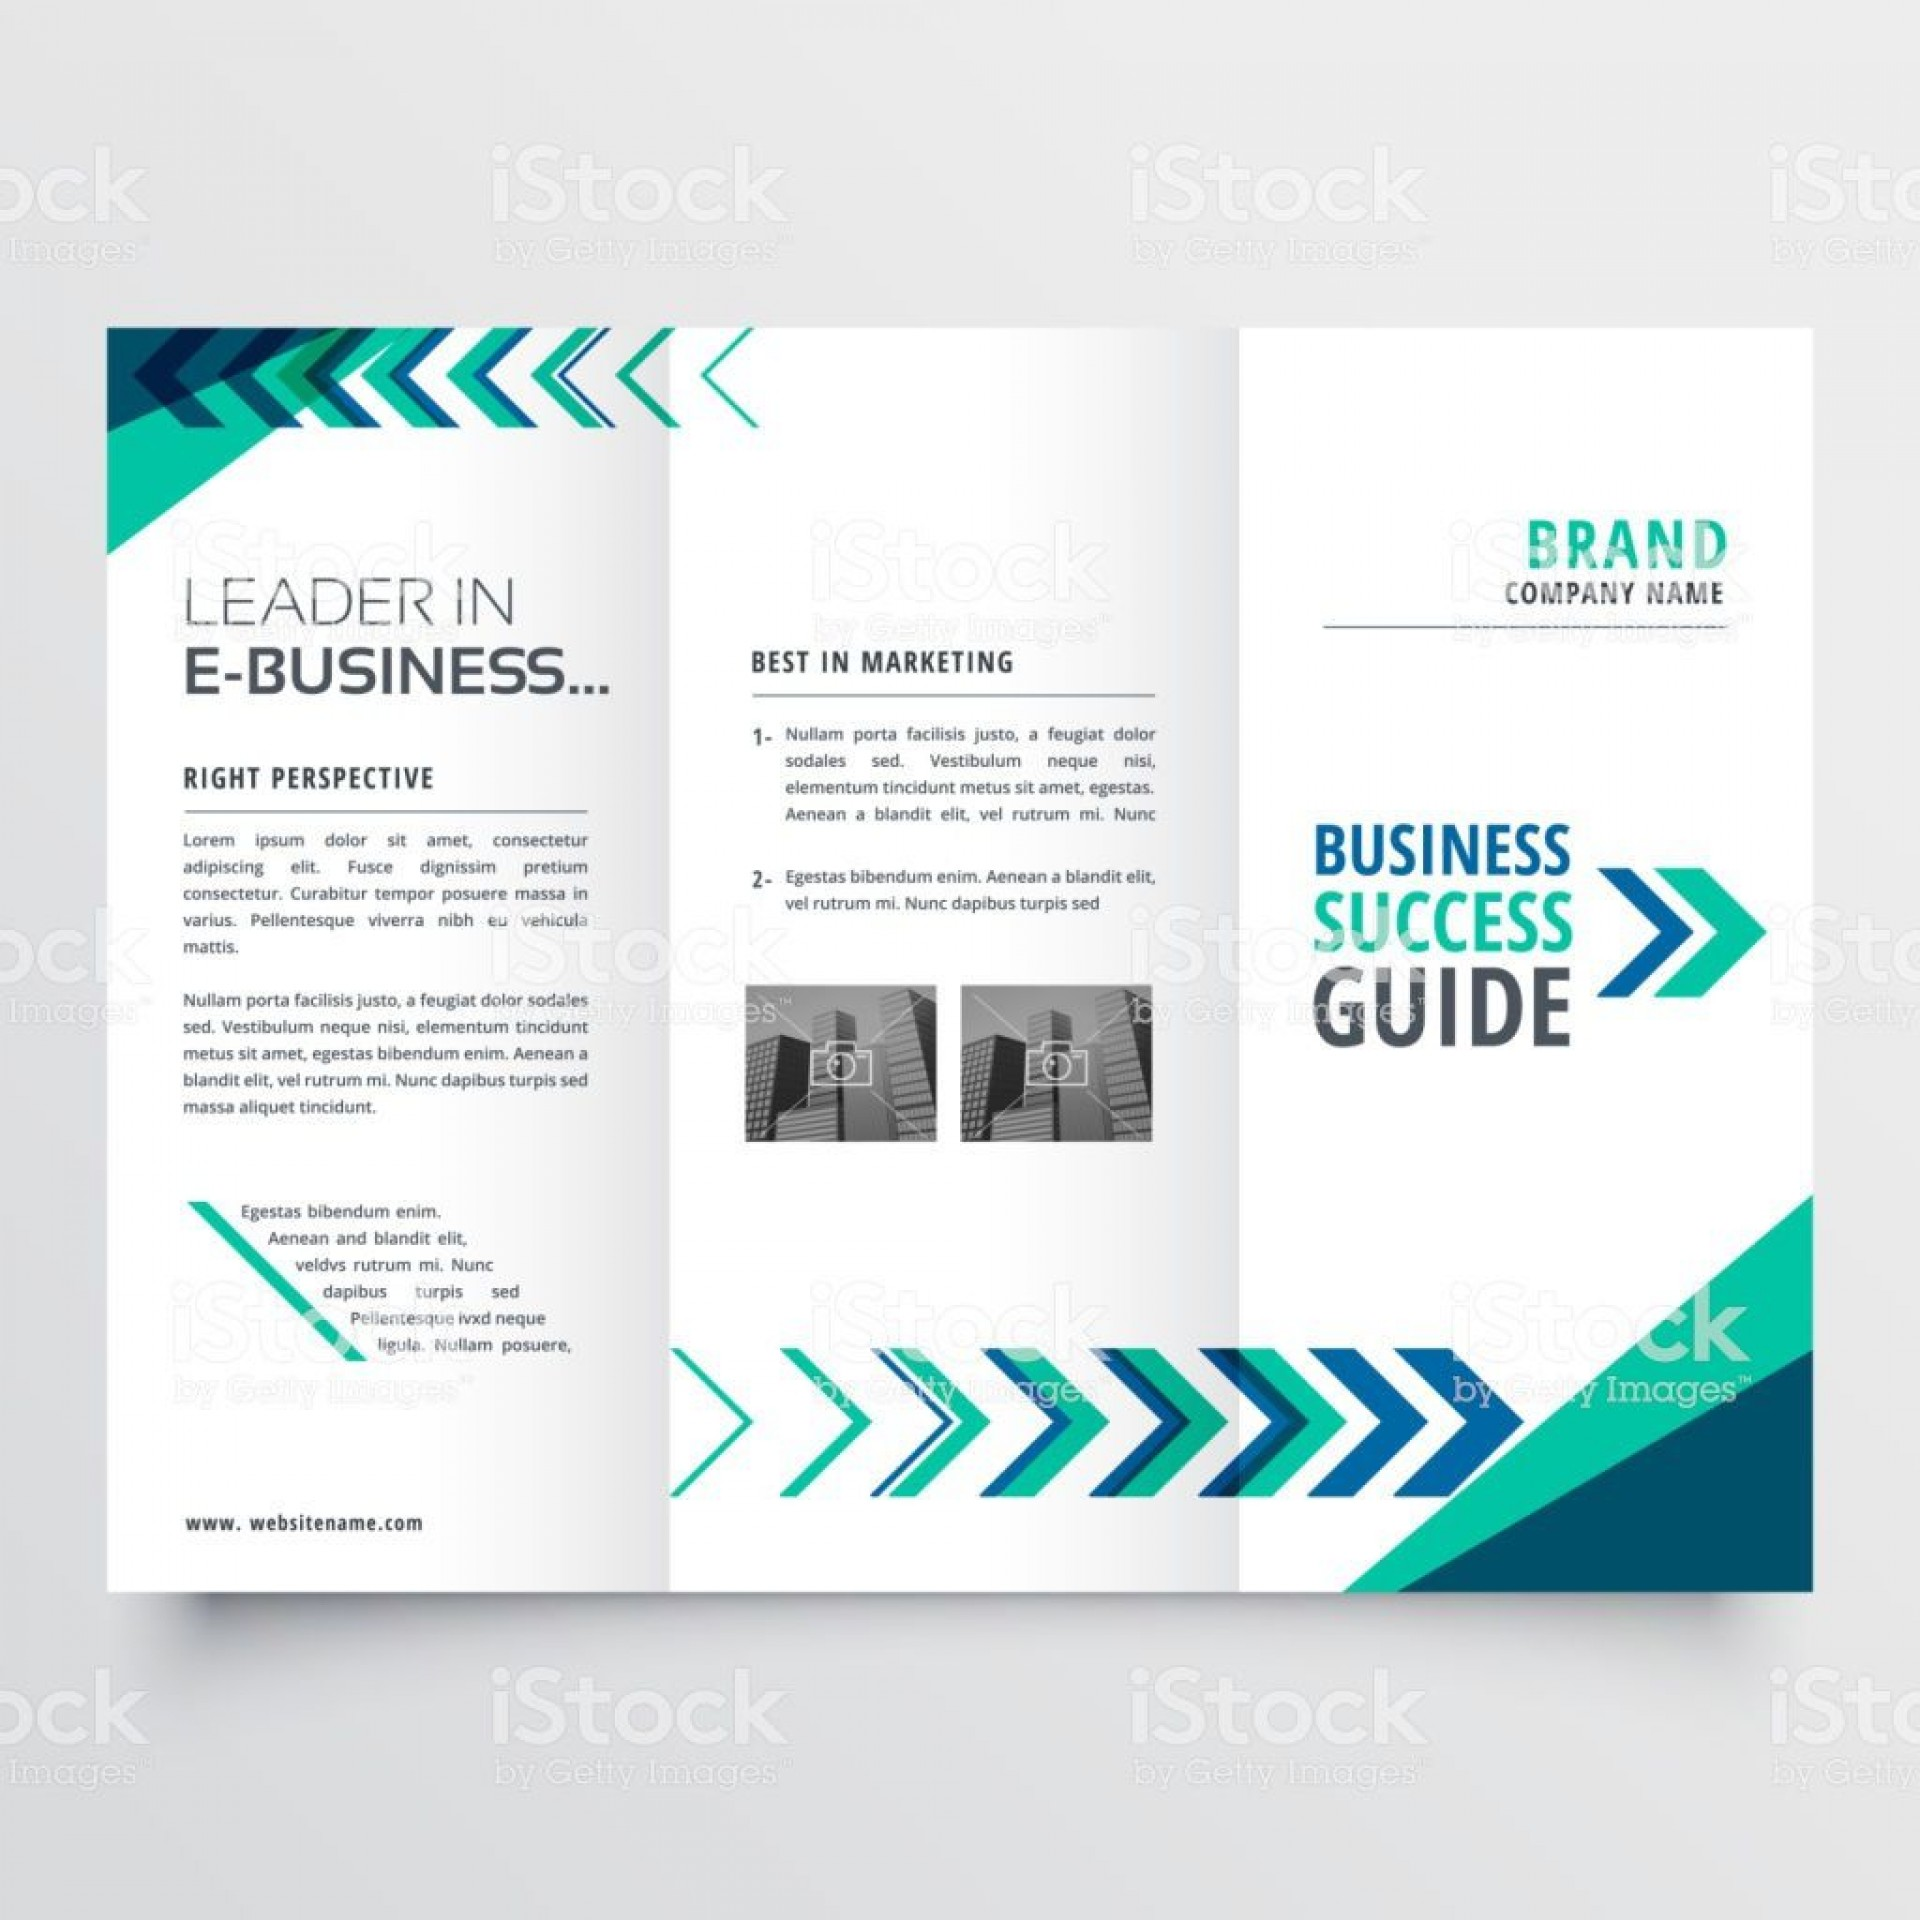 006 Stupendou Tri Fold Brochure Template Free High Resolution  Download Photoshop M Word Tri-fold Indesign Mac1920